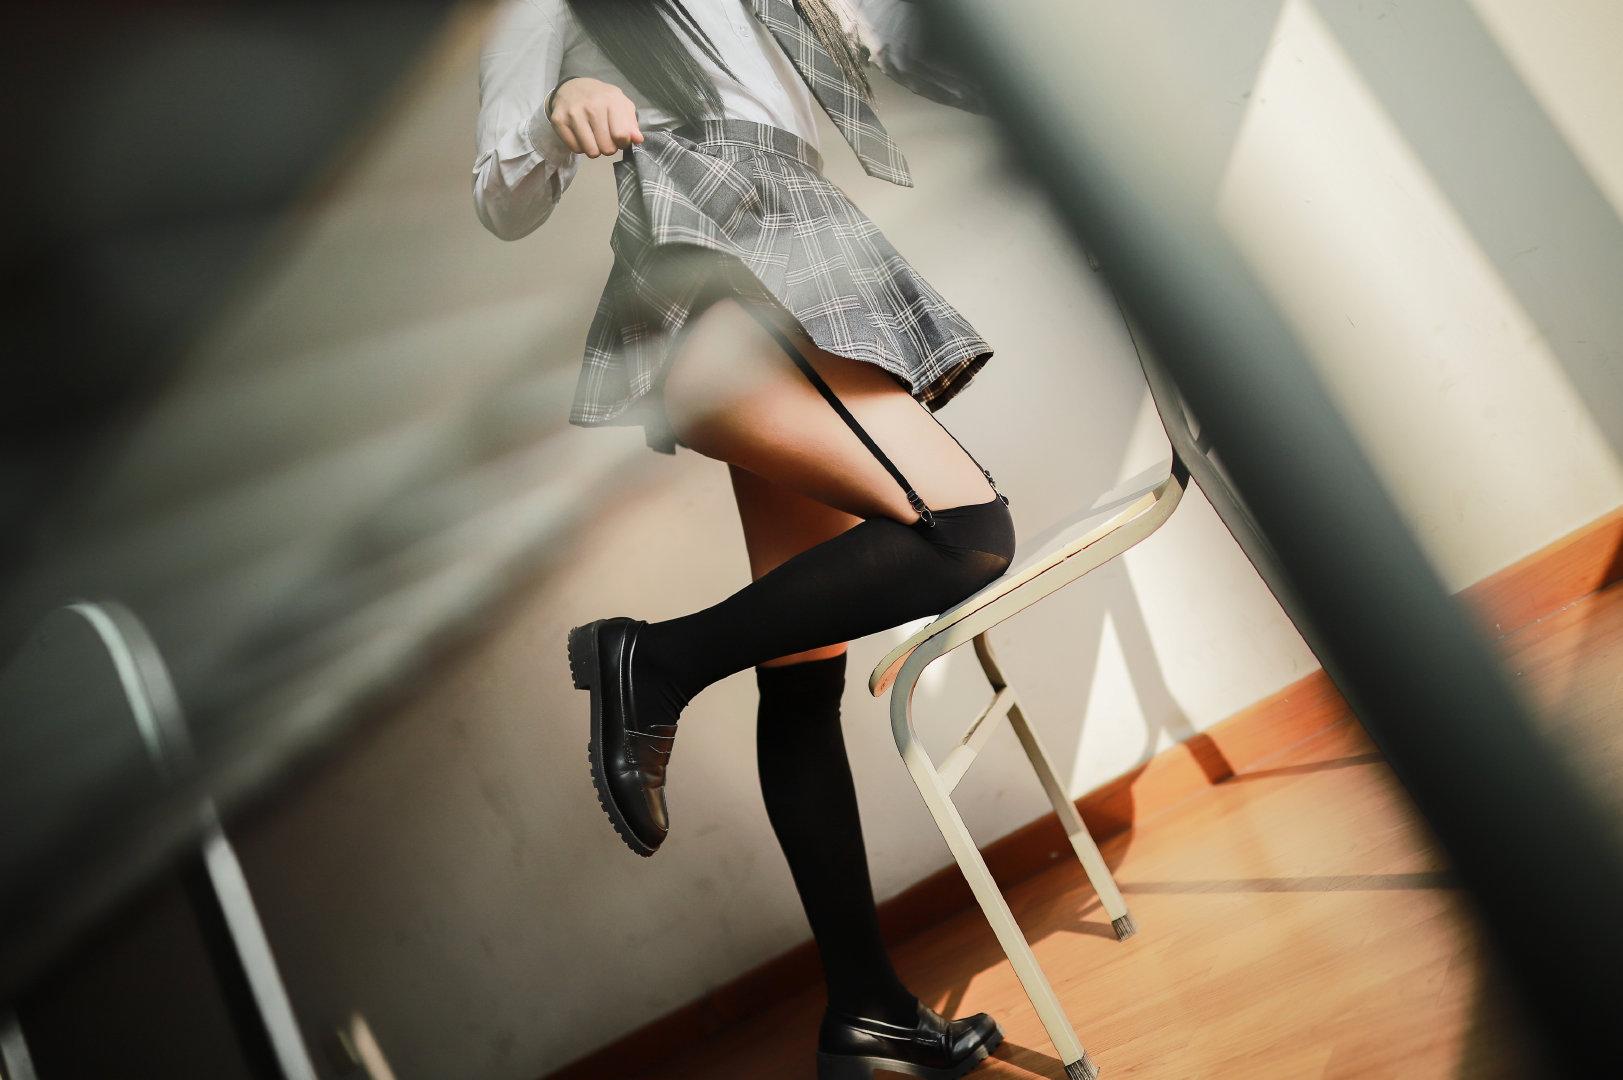 JK制服妹子的教室写真,摄影师角度刁钻